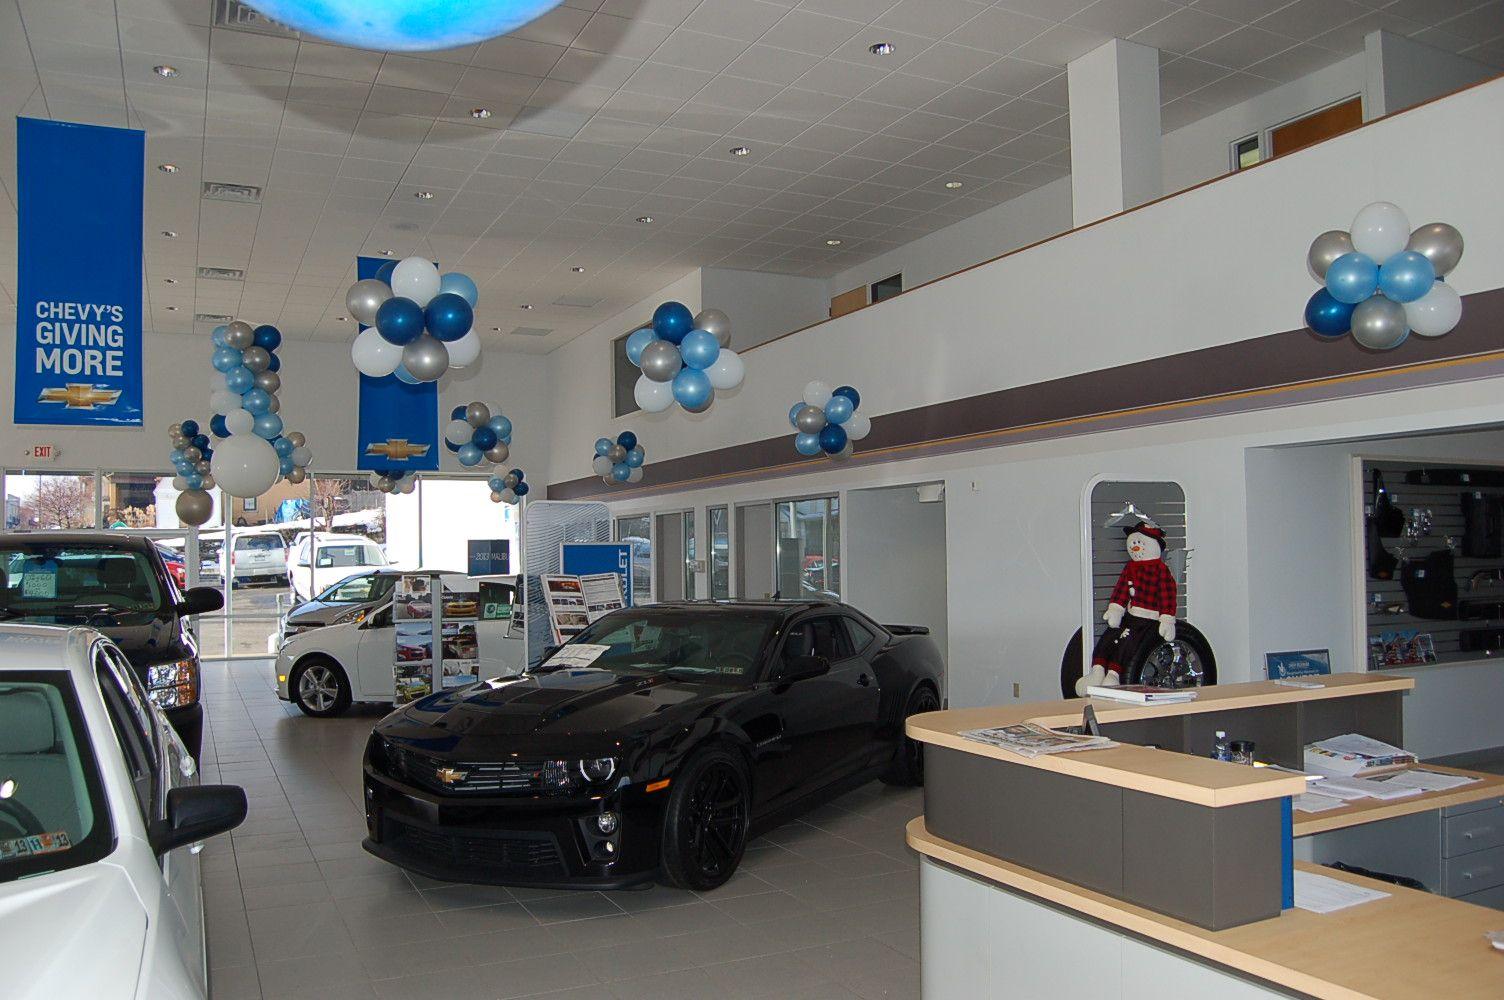 Nick Chevrolet Tarentum Pa Tarentum Corporate Design Car Dealership